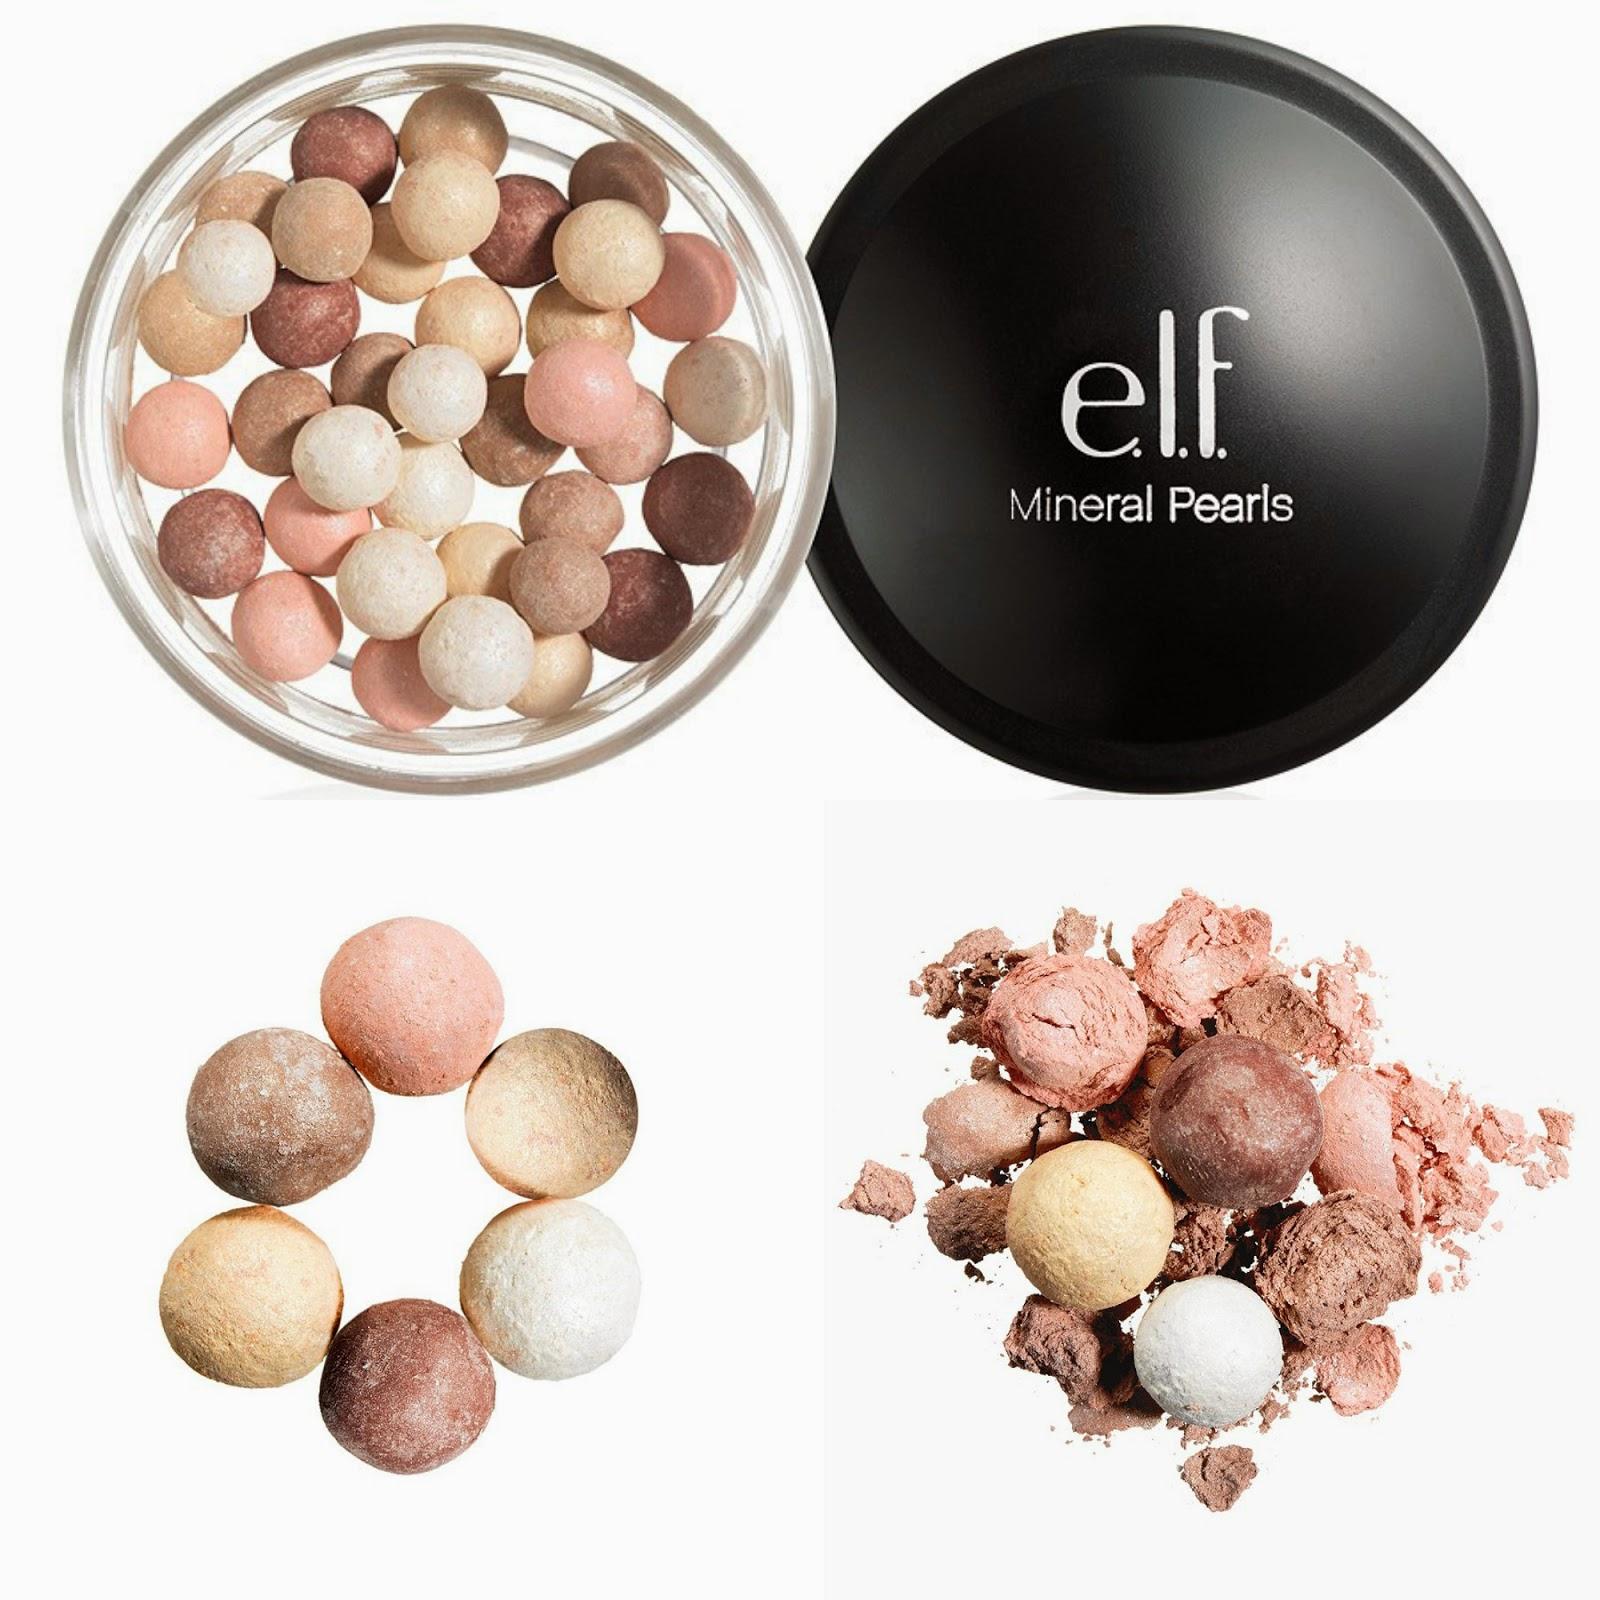 e.l.f Mineral Pearls Natural